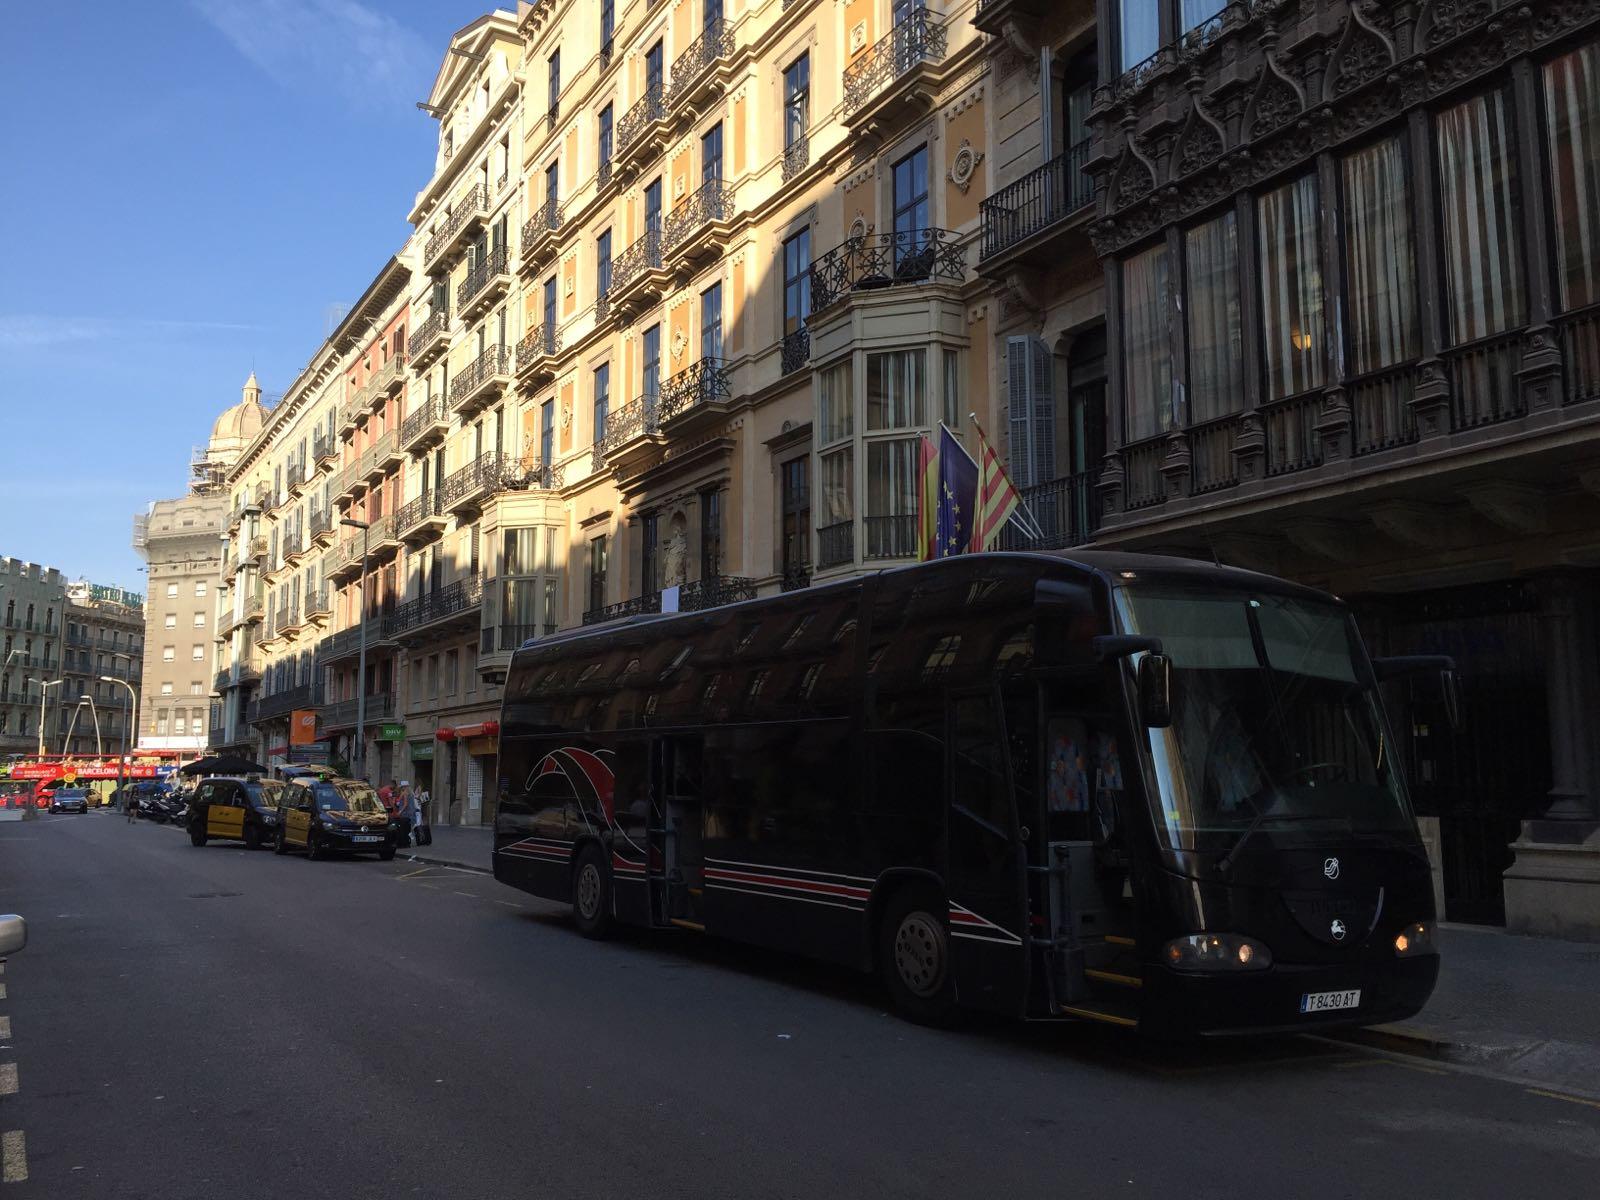 Bus 55 seats